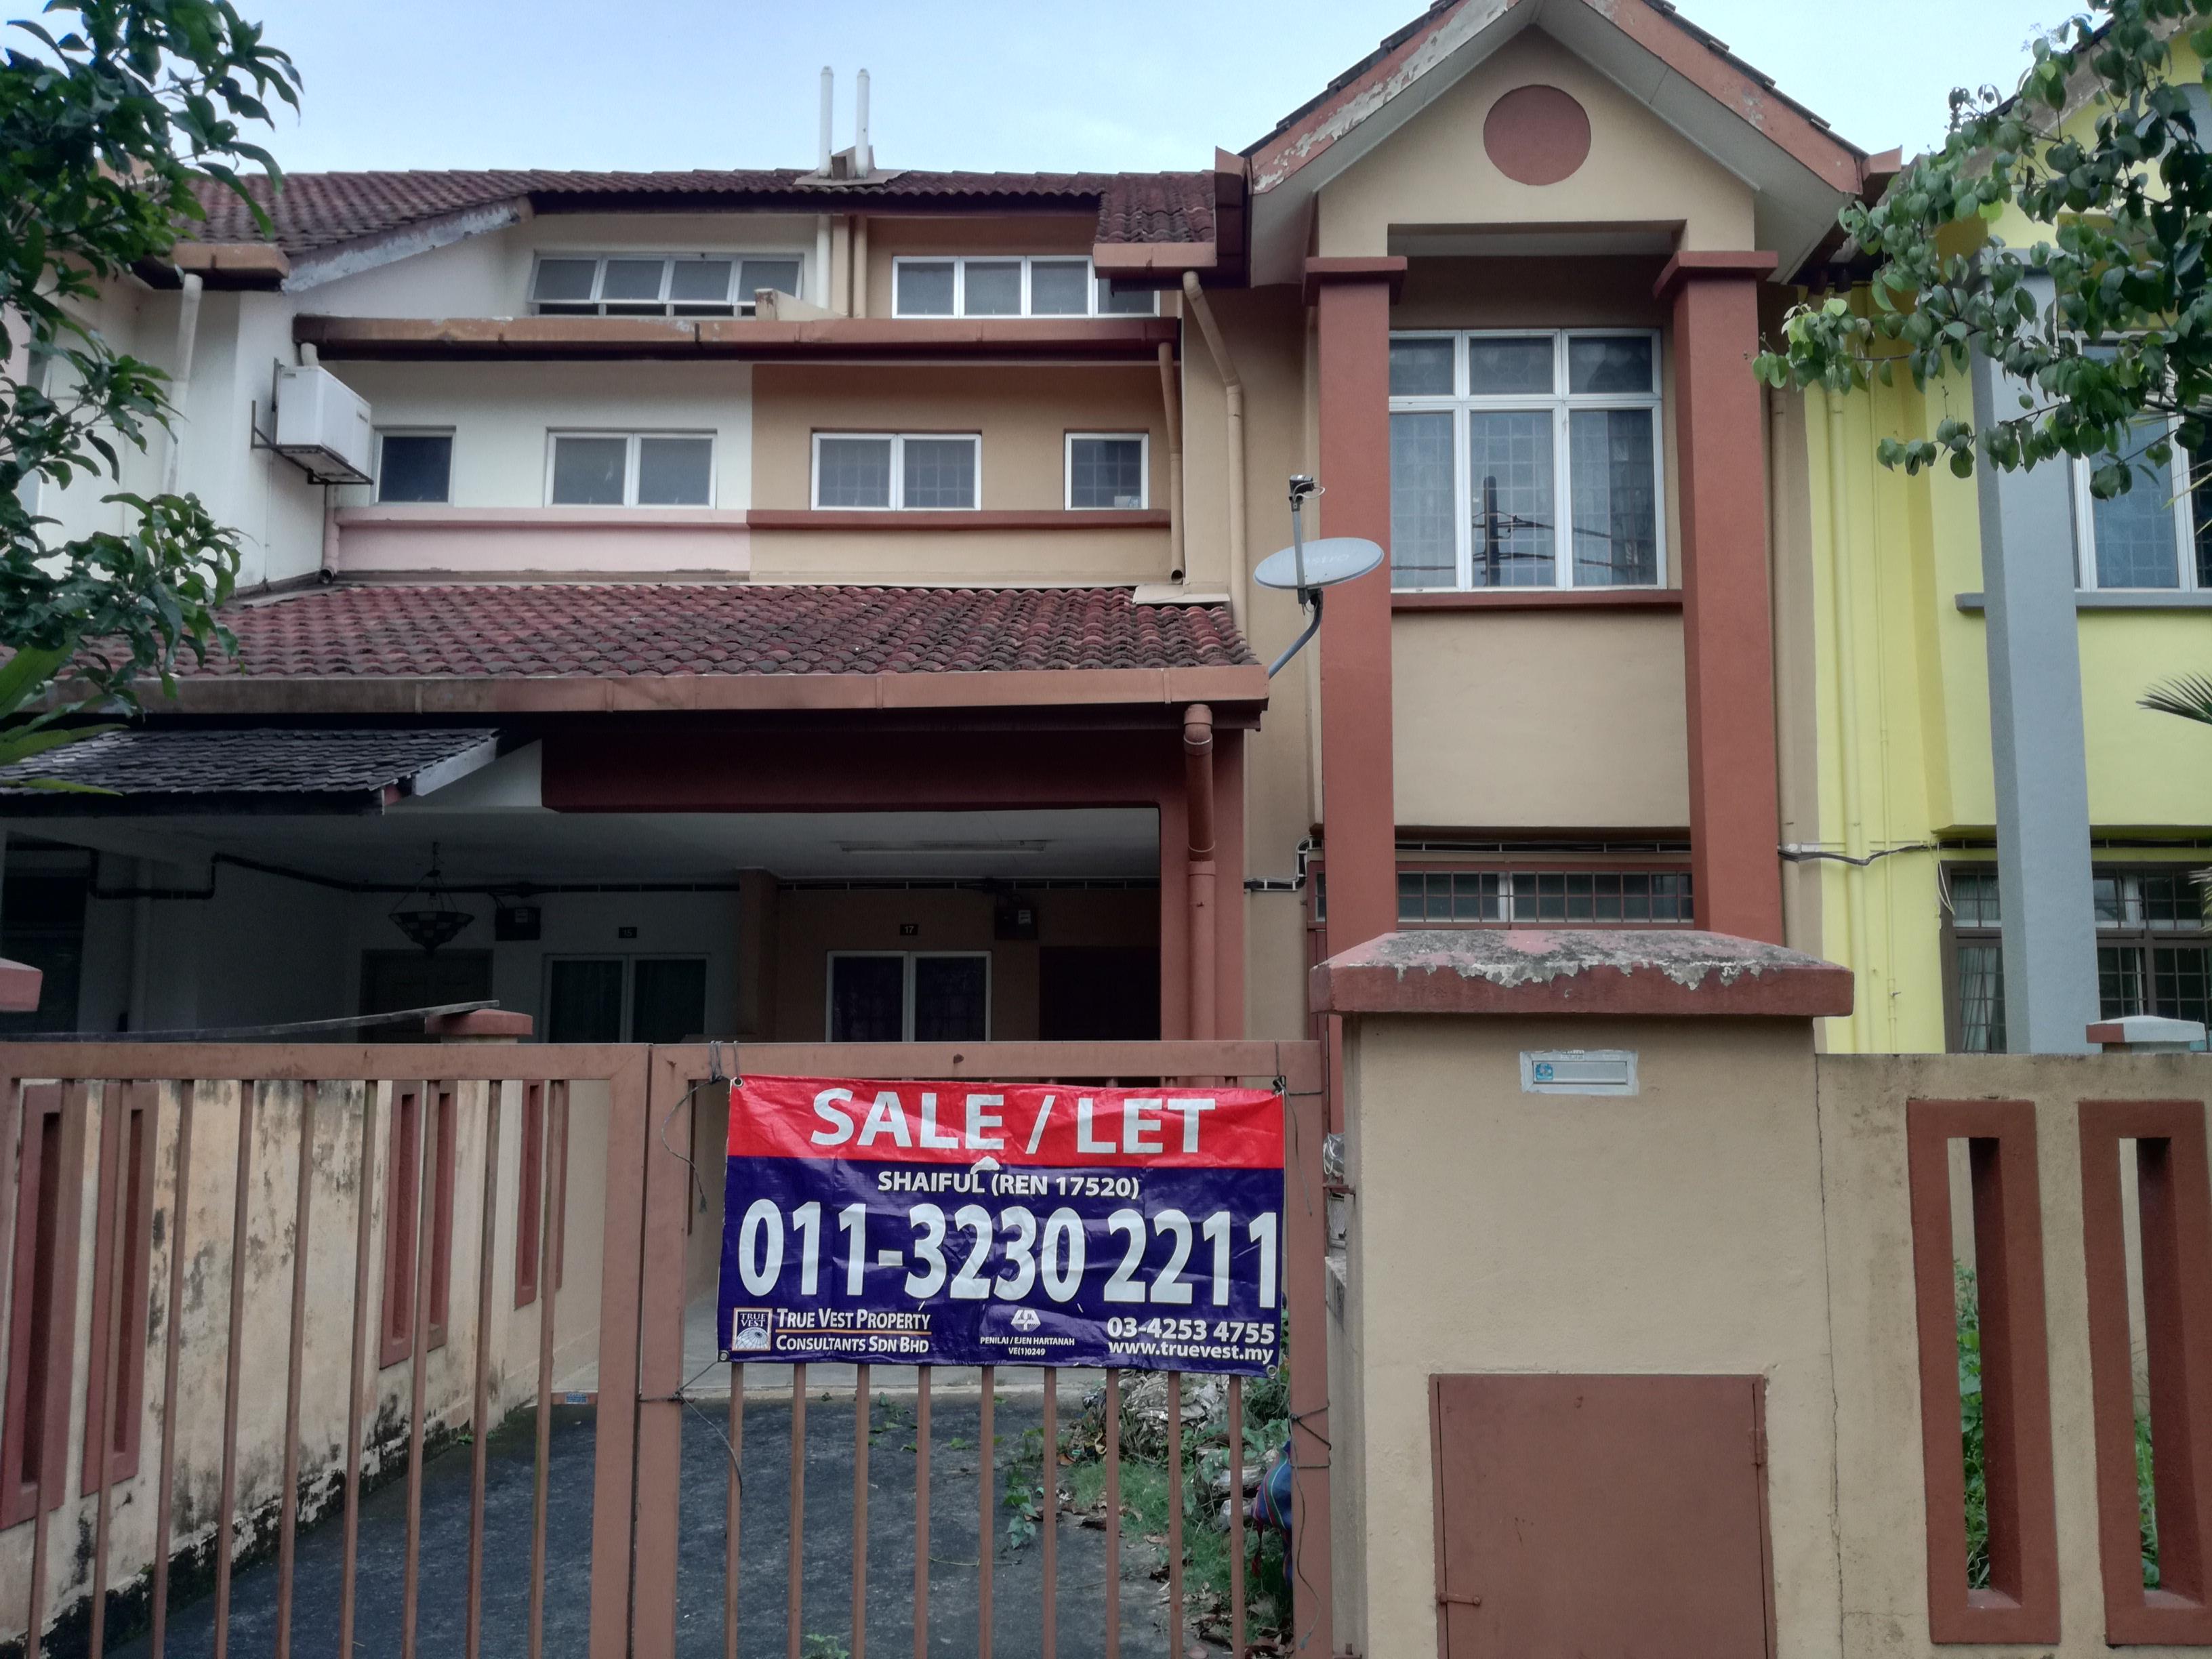 2 Storey House, Taman Tun Perak, Rawang Selangor